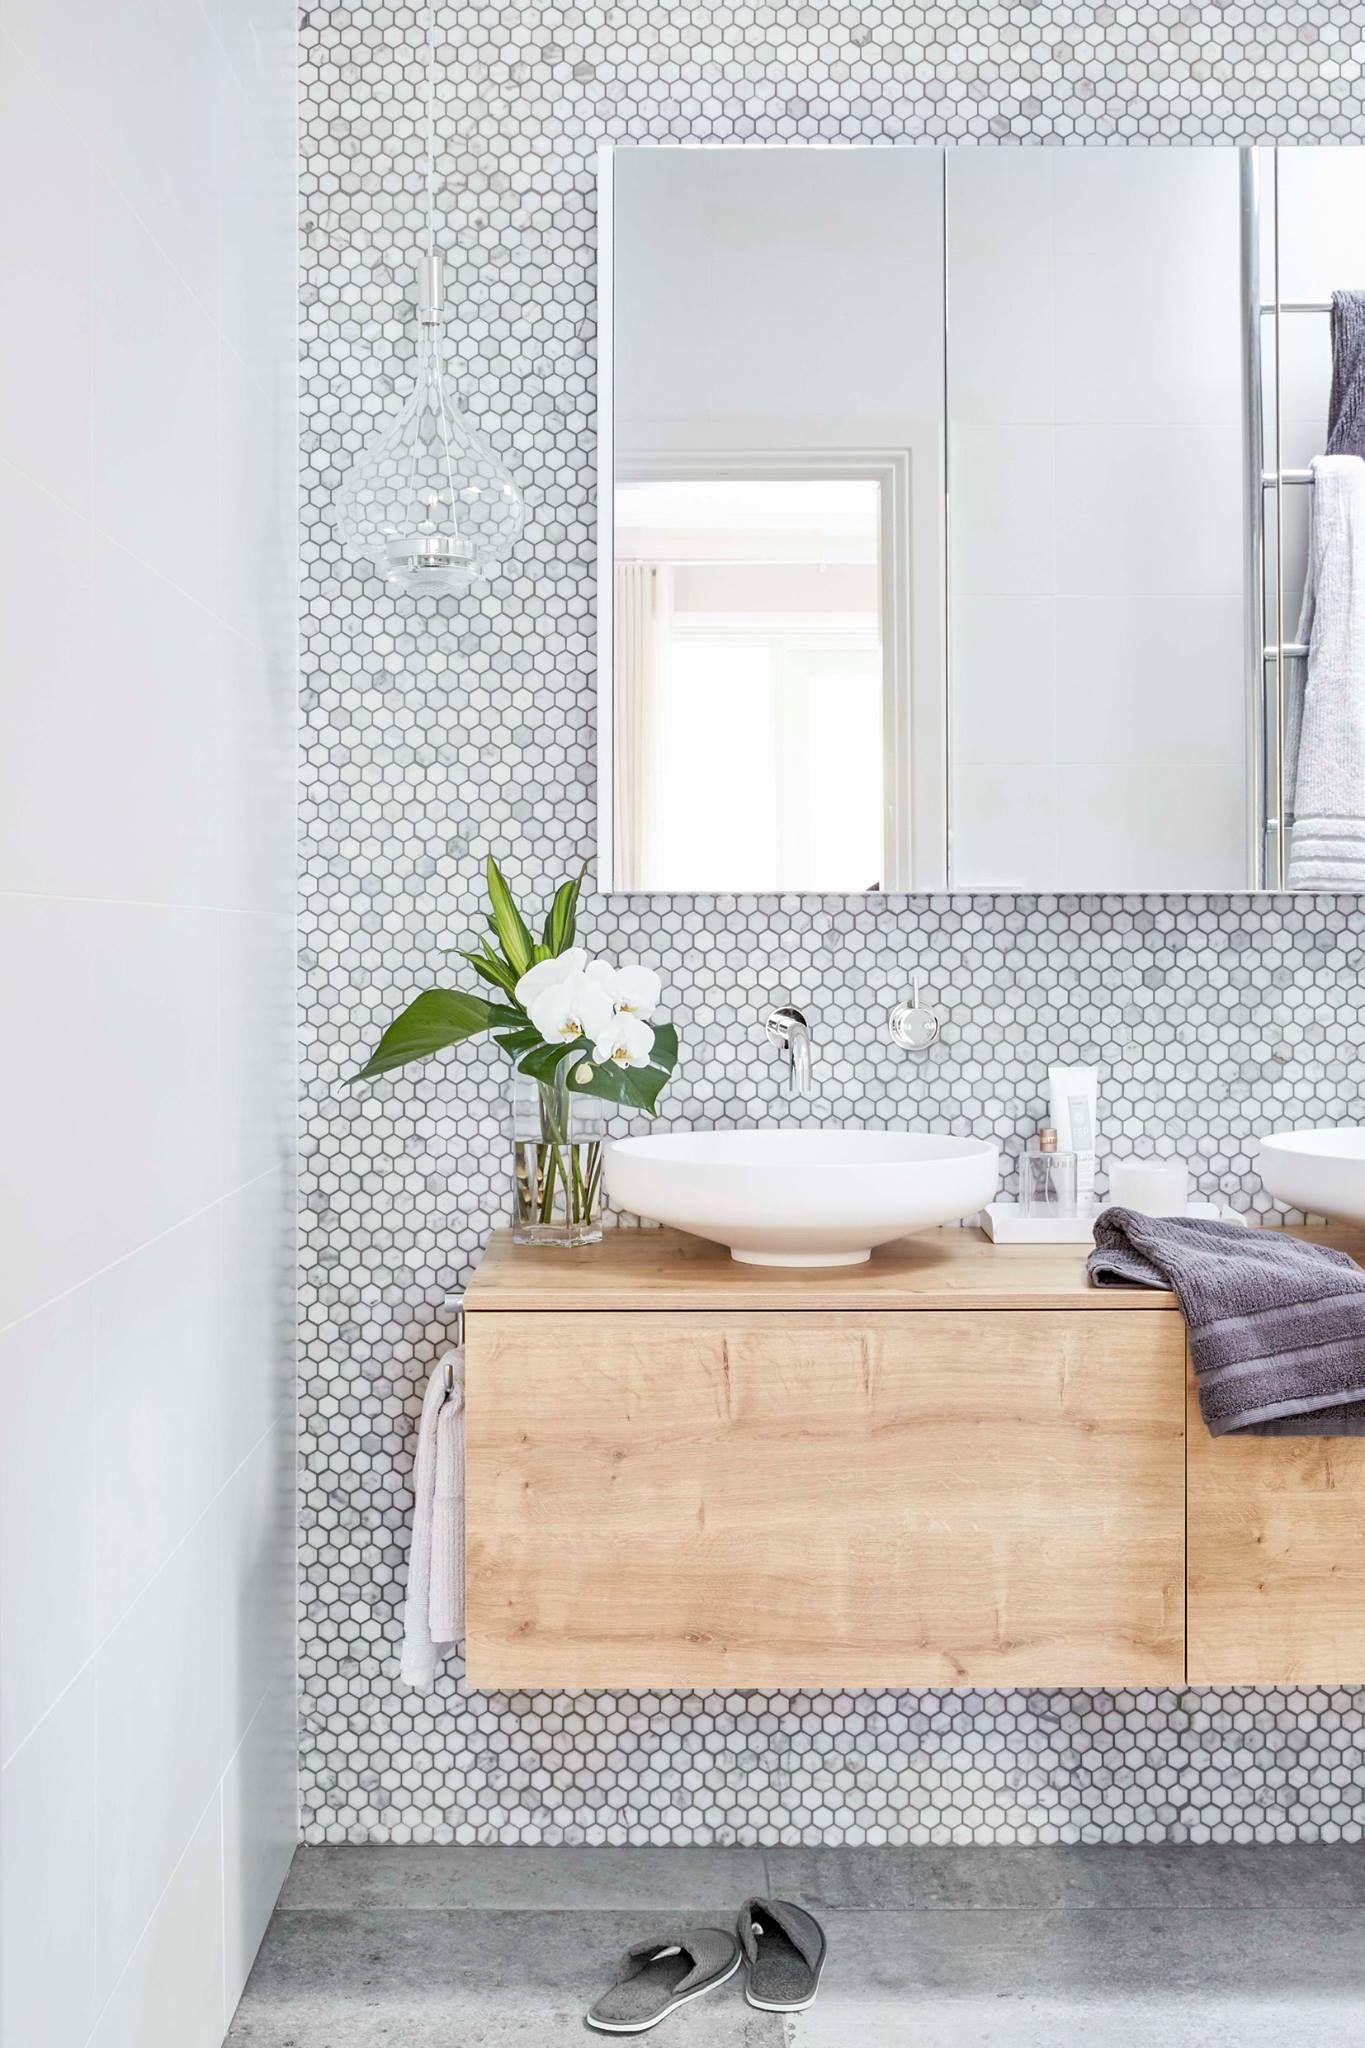 Si Estás Pensando En Reformar Tu Baño, Este Tip Te Será De Gran Ayuda.  Mirrored Tile ...